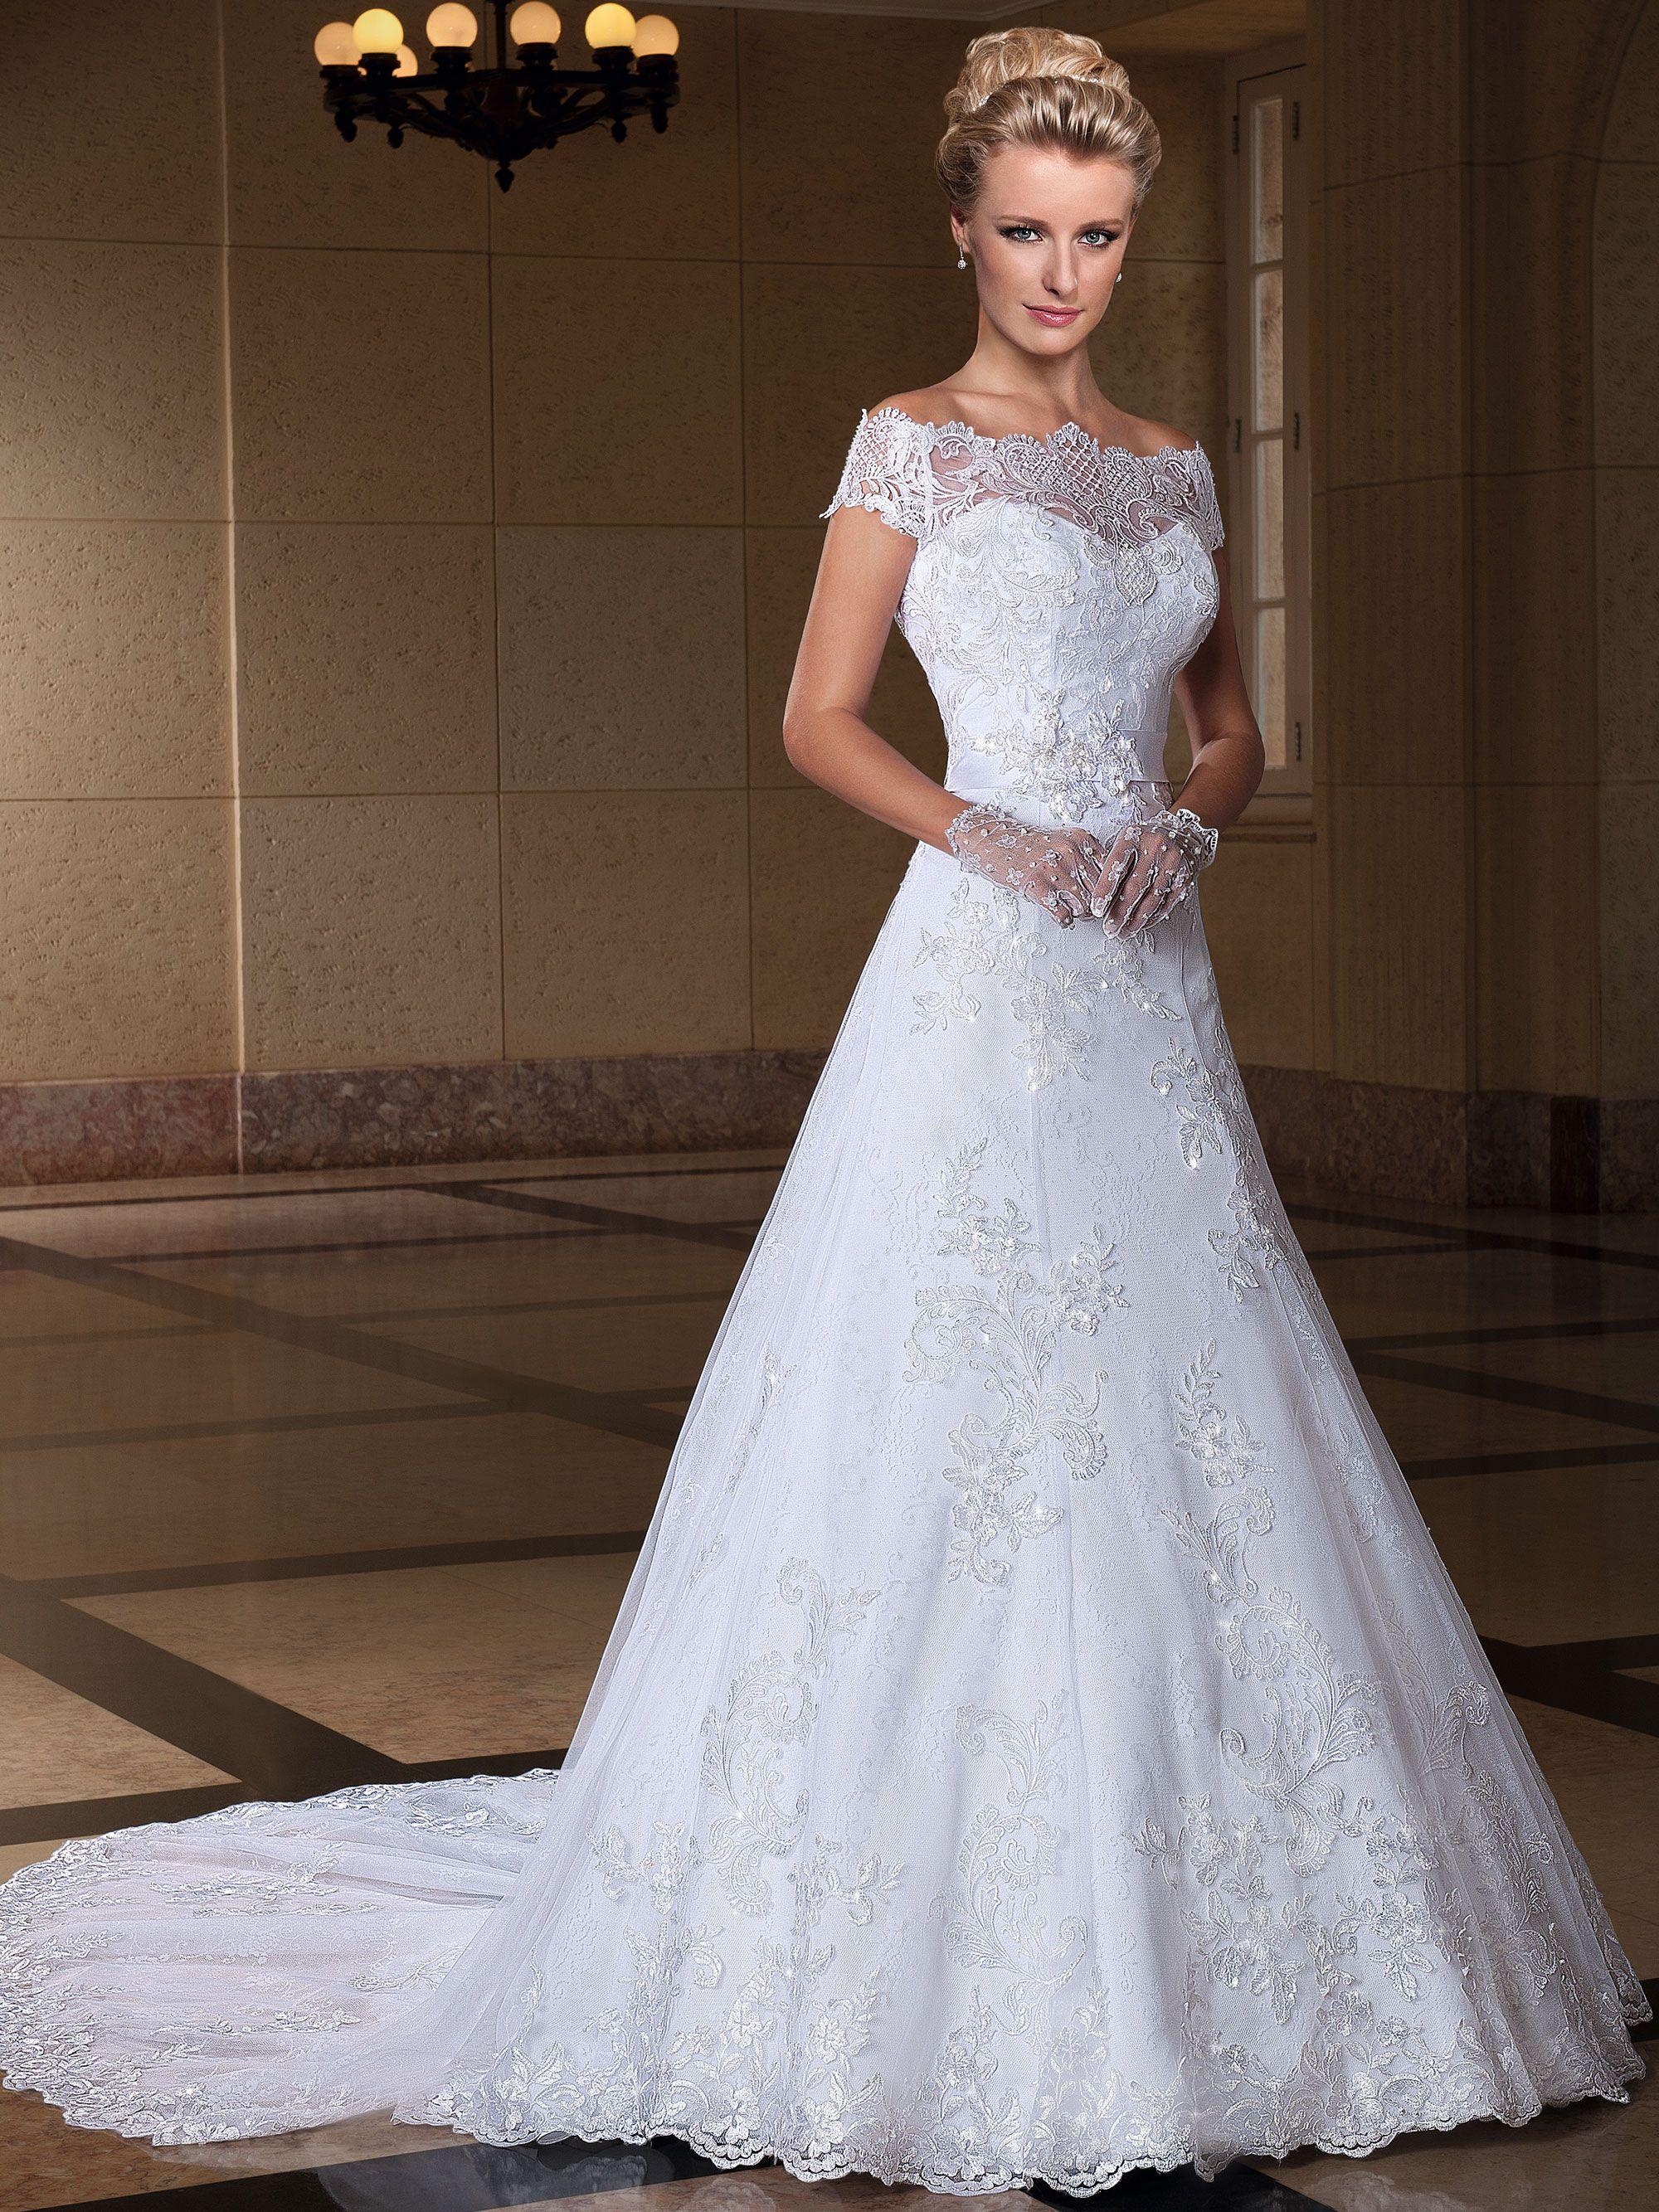 Vestido renda noiva festa simples casamento decote manga